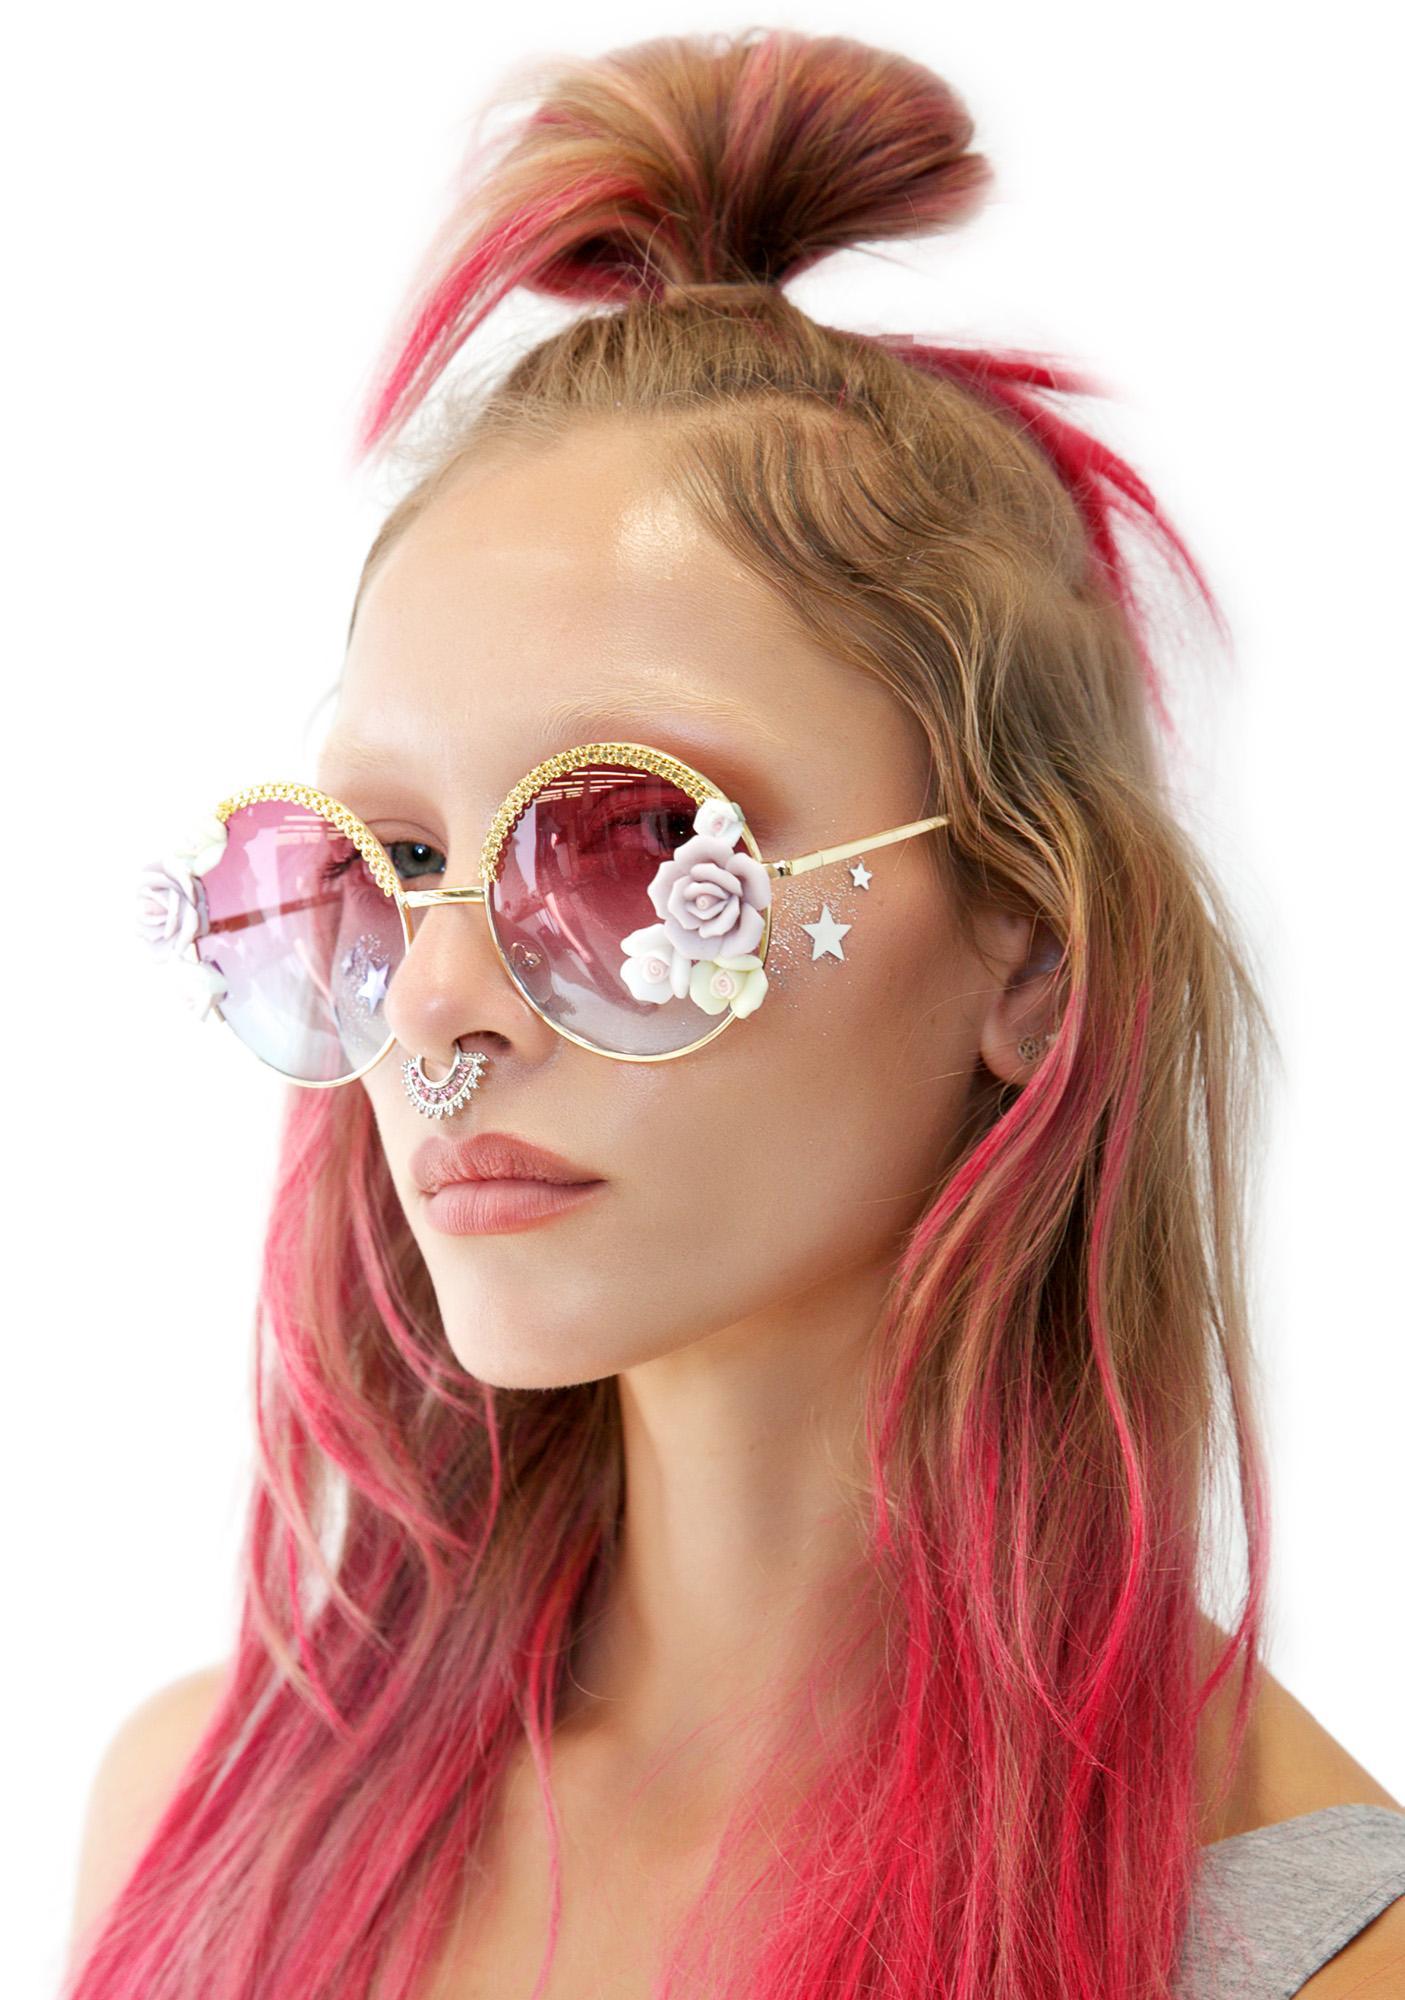 Tnemnroda We The Roses Sunglasses